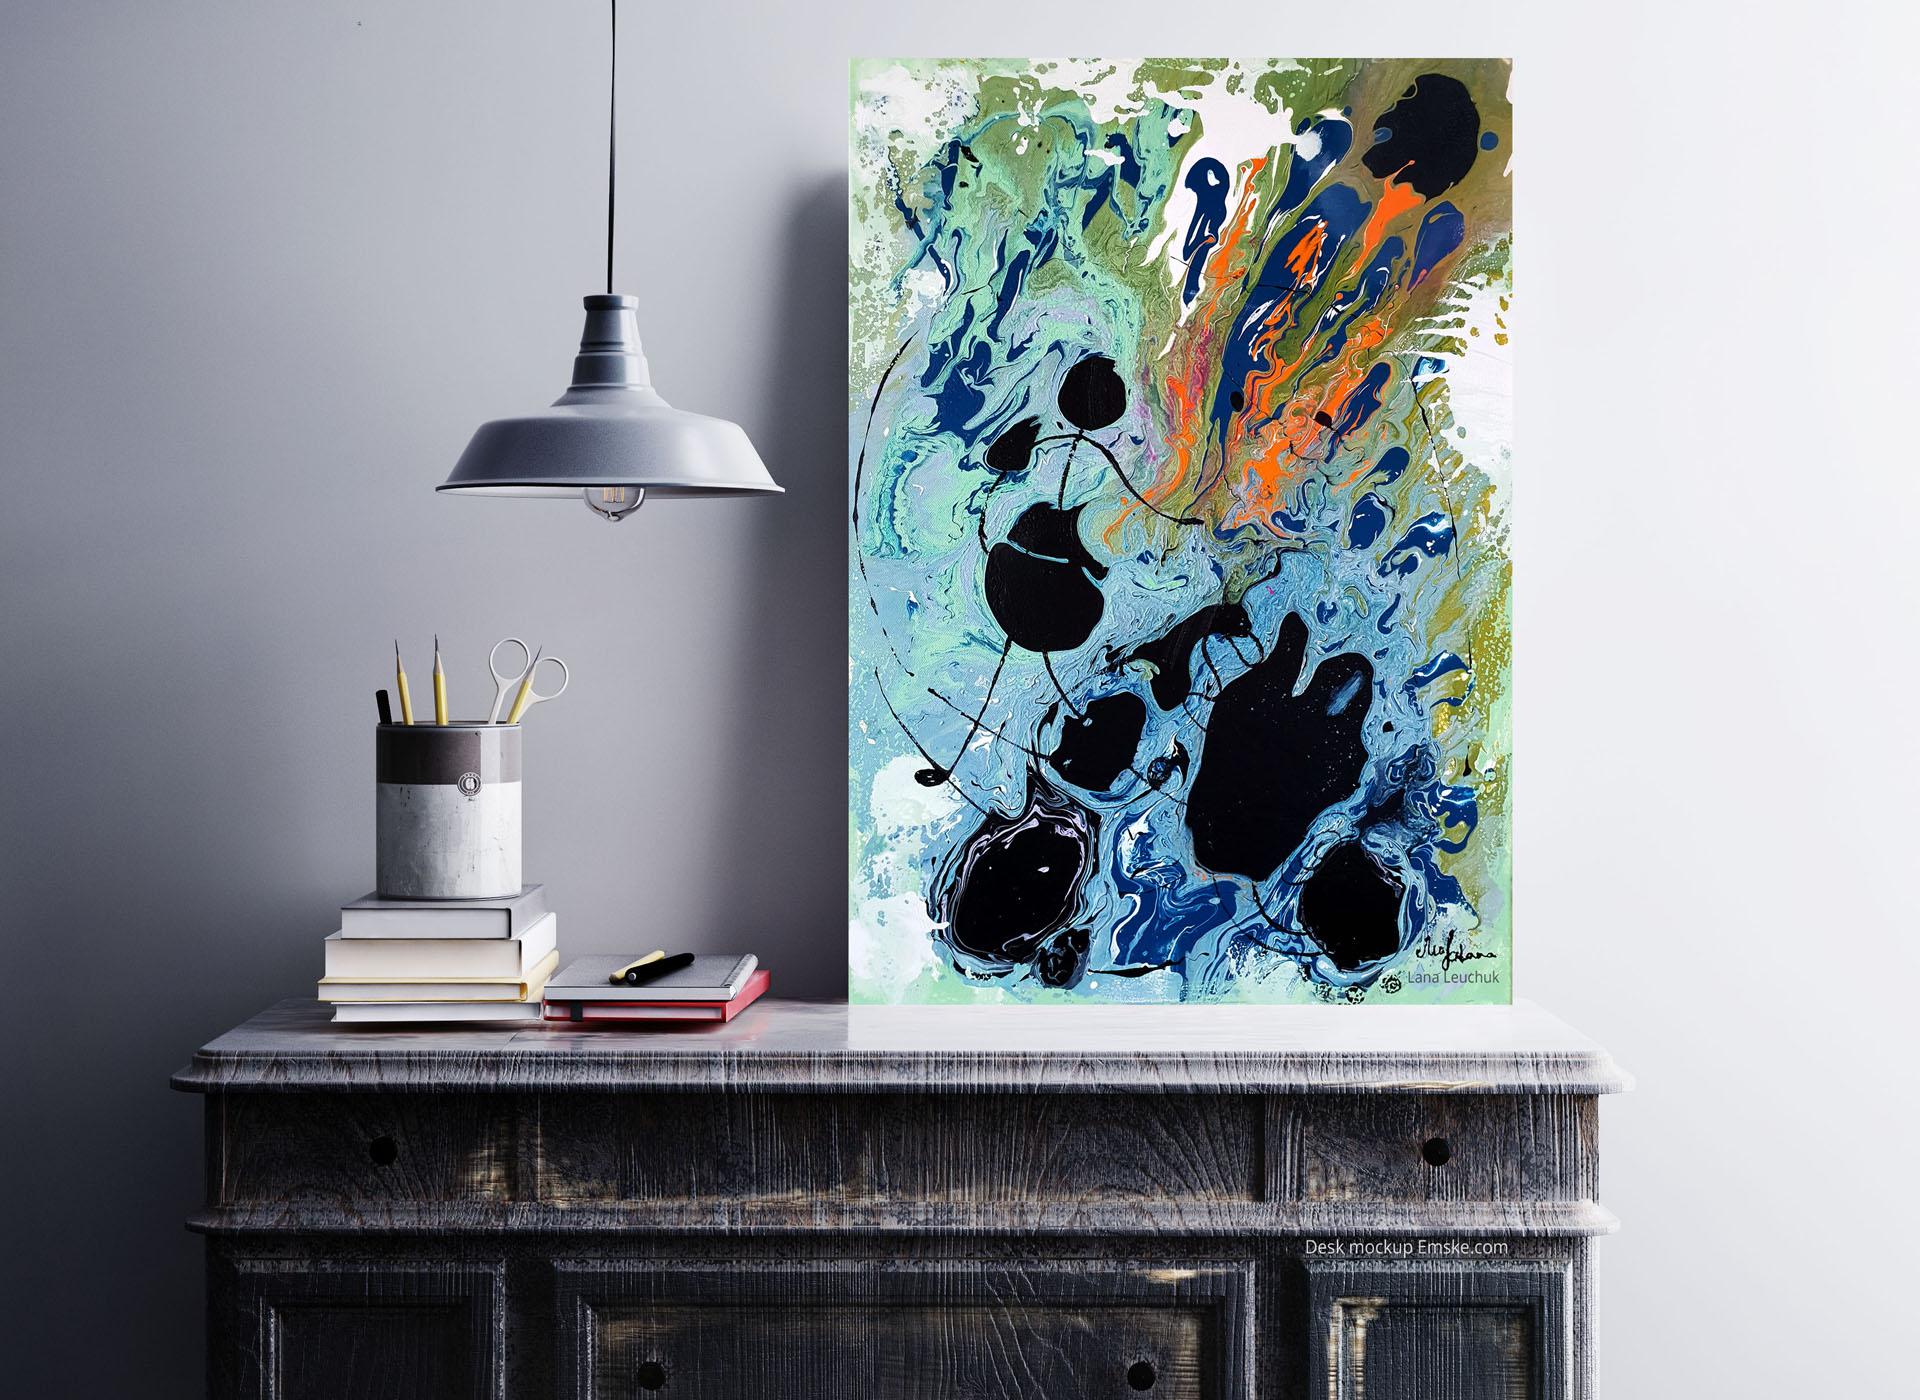 art-in-interior-Movements-by-Lana Leuchuk